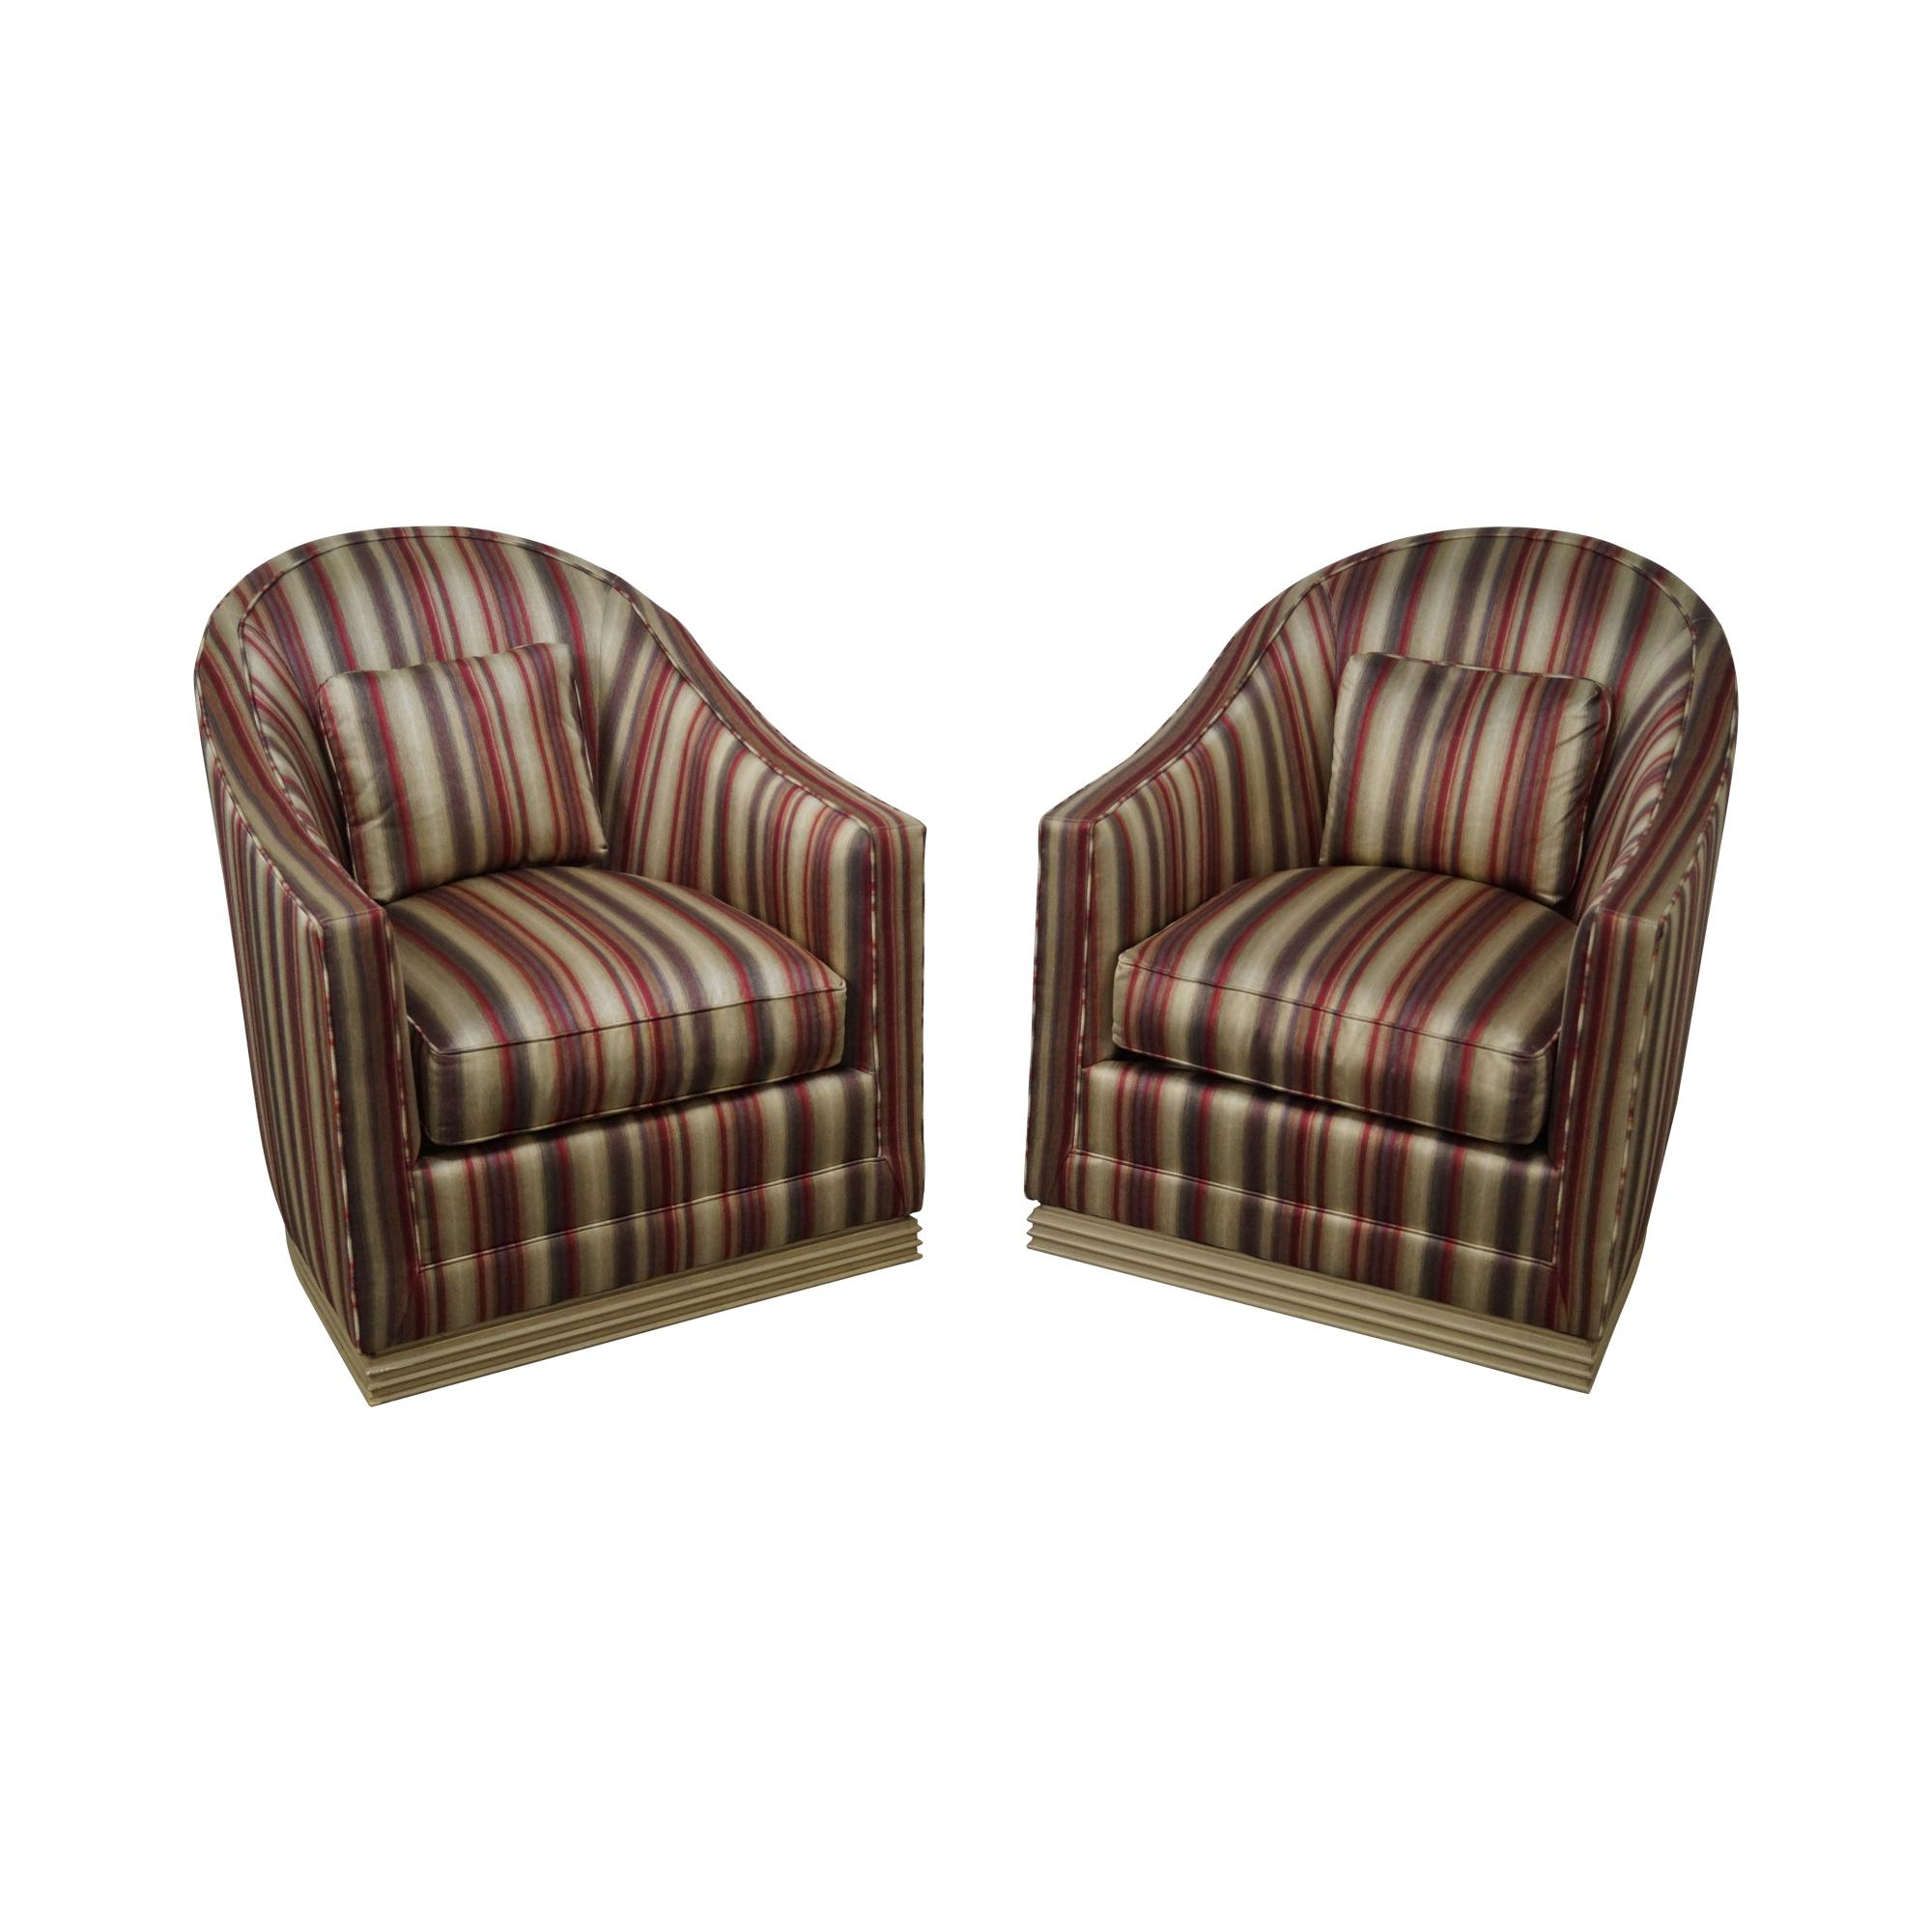 barrel chairs swivel rocker kneeling desk chair vanguard back lounge a pair chairish